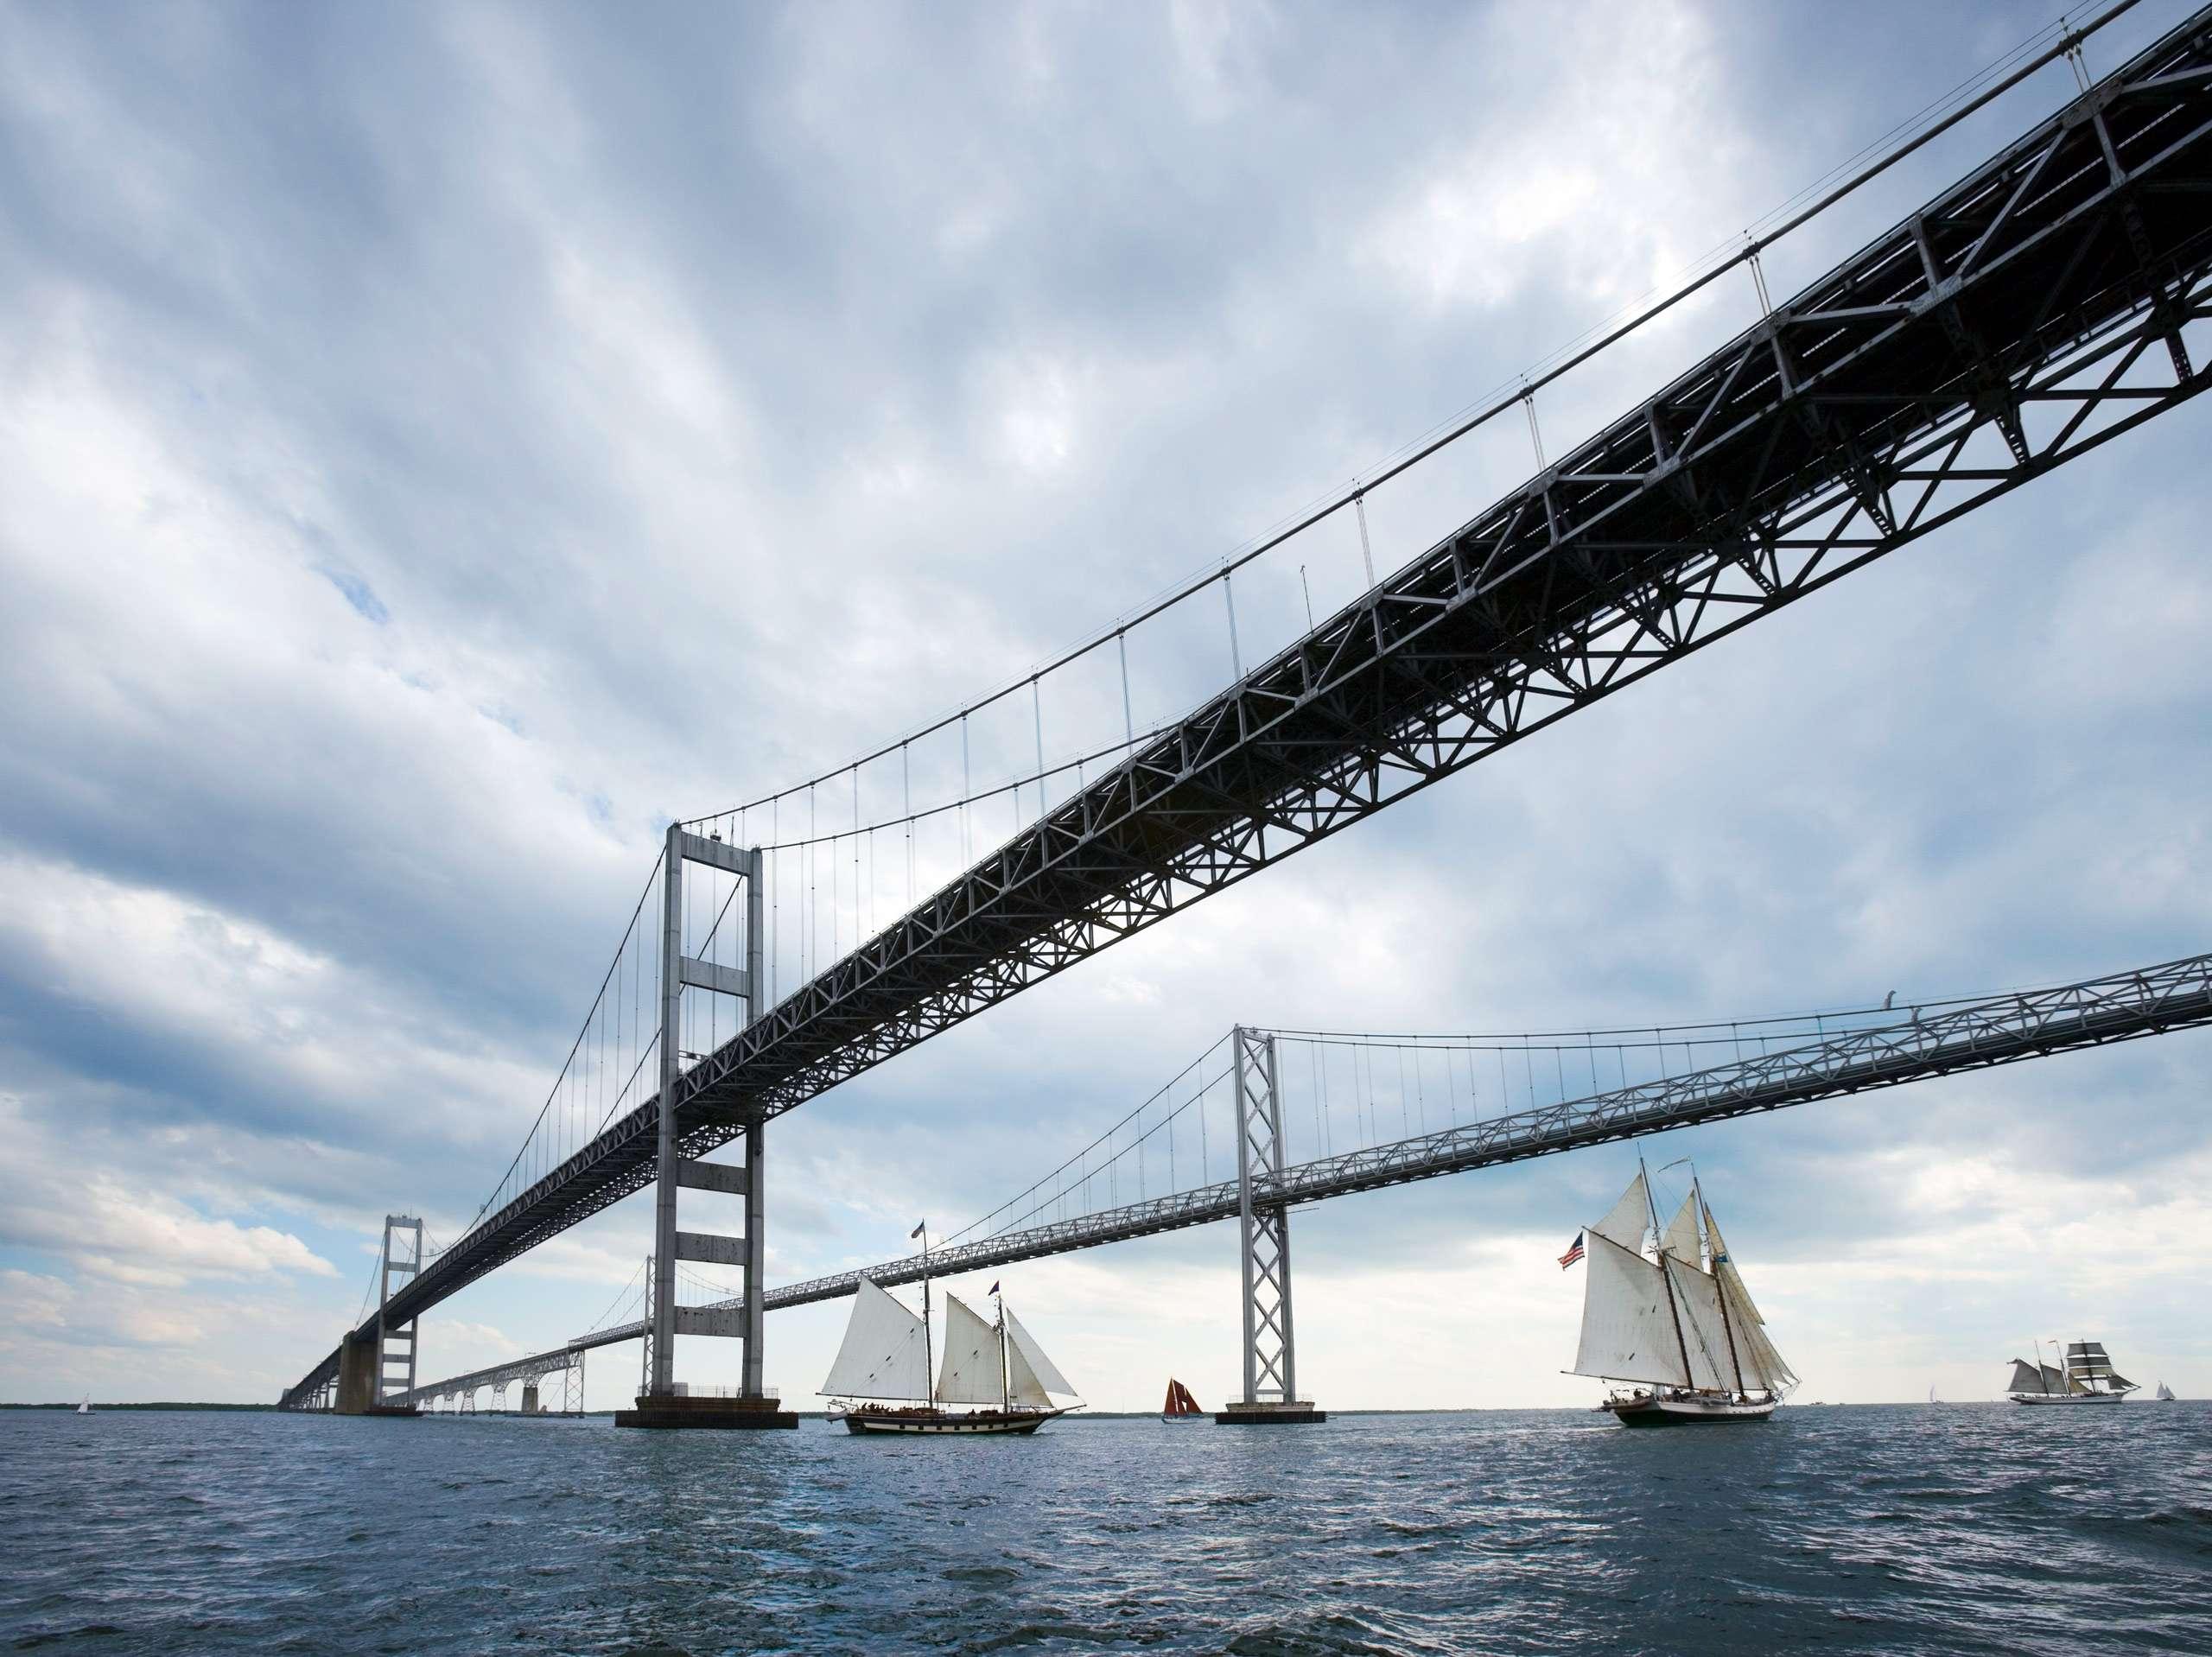 PORTFOLIO - Sailing - Chesapeake #31-PCG193